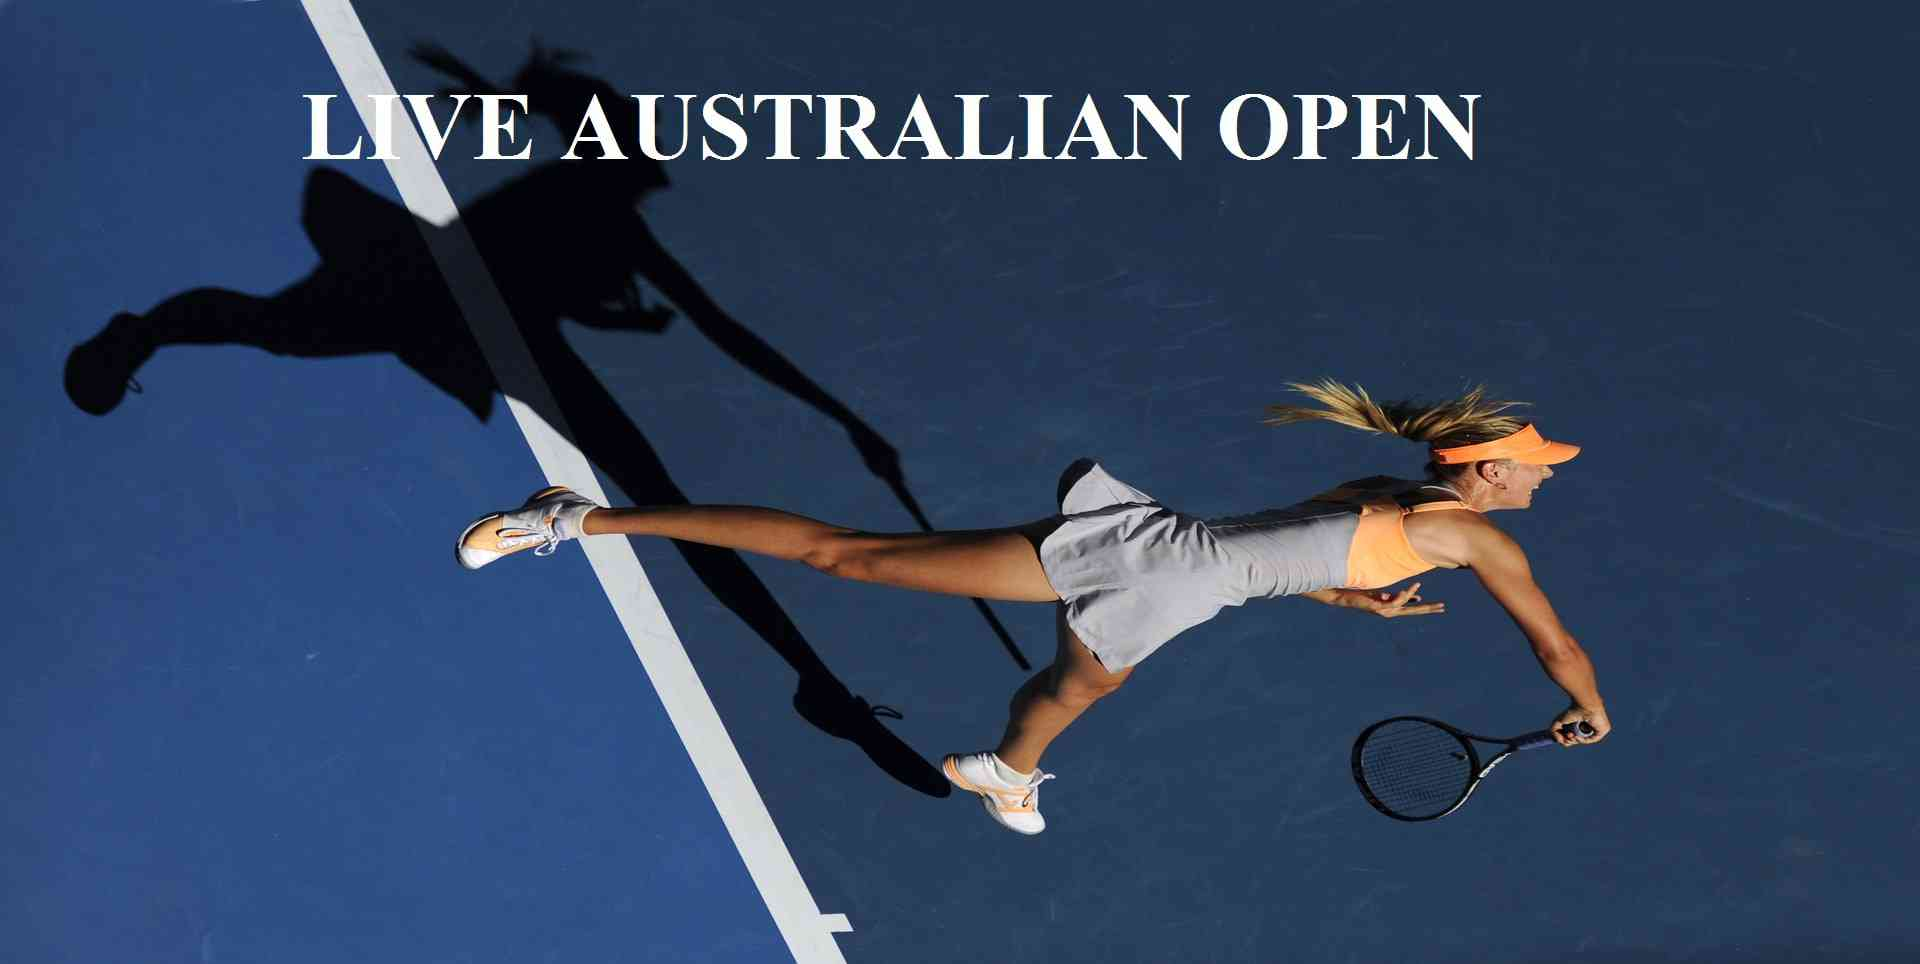 2017 Australian Open Schedule